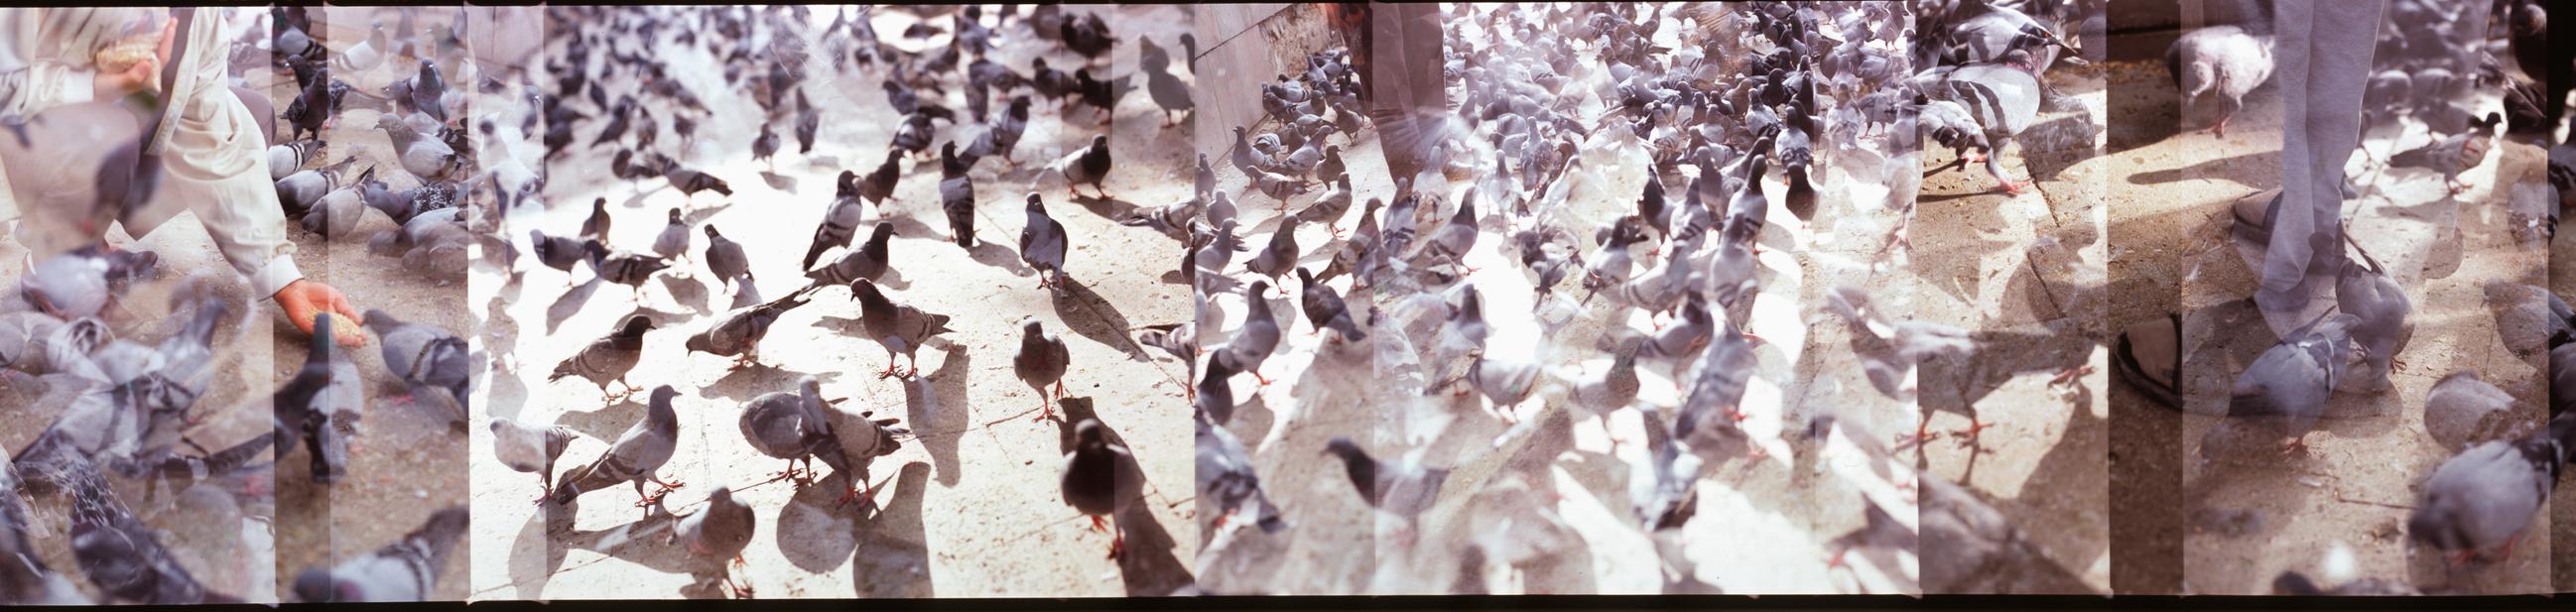 Ankara-Ulus-pigeons-2-web